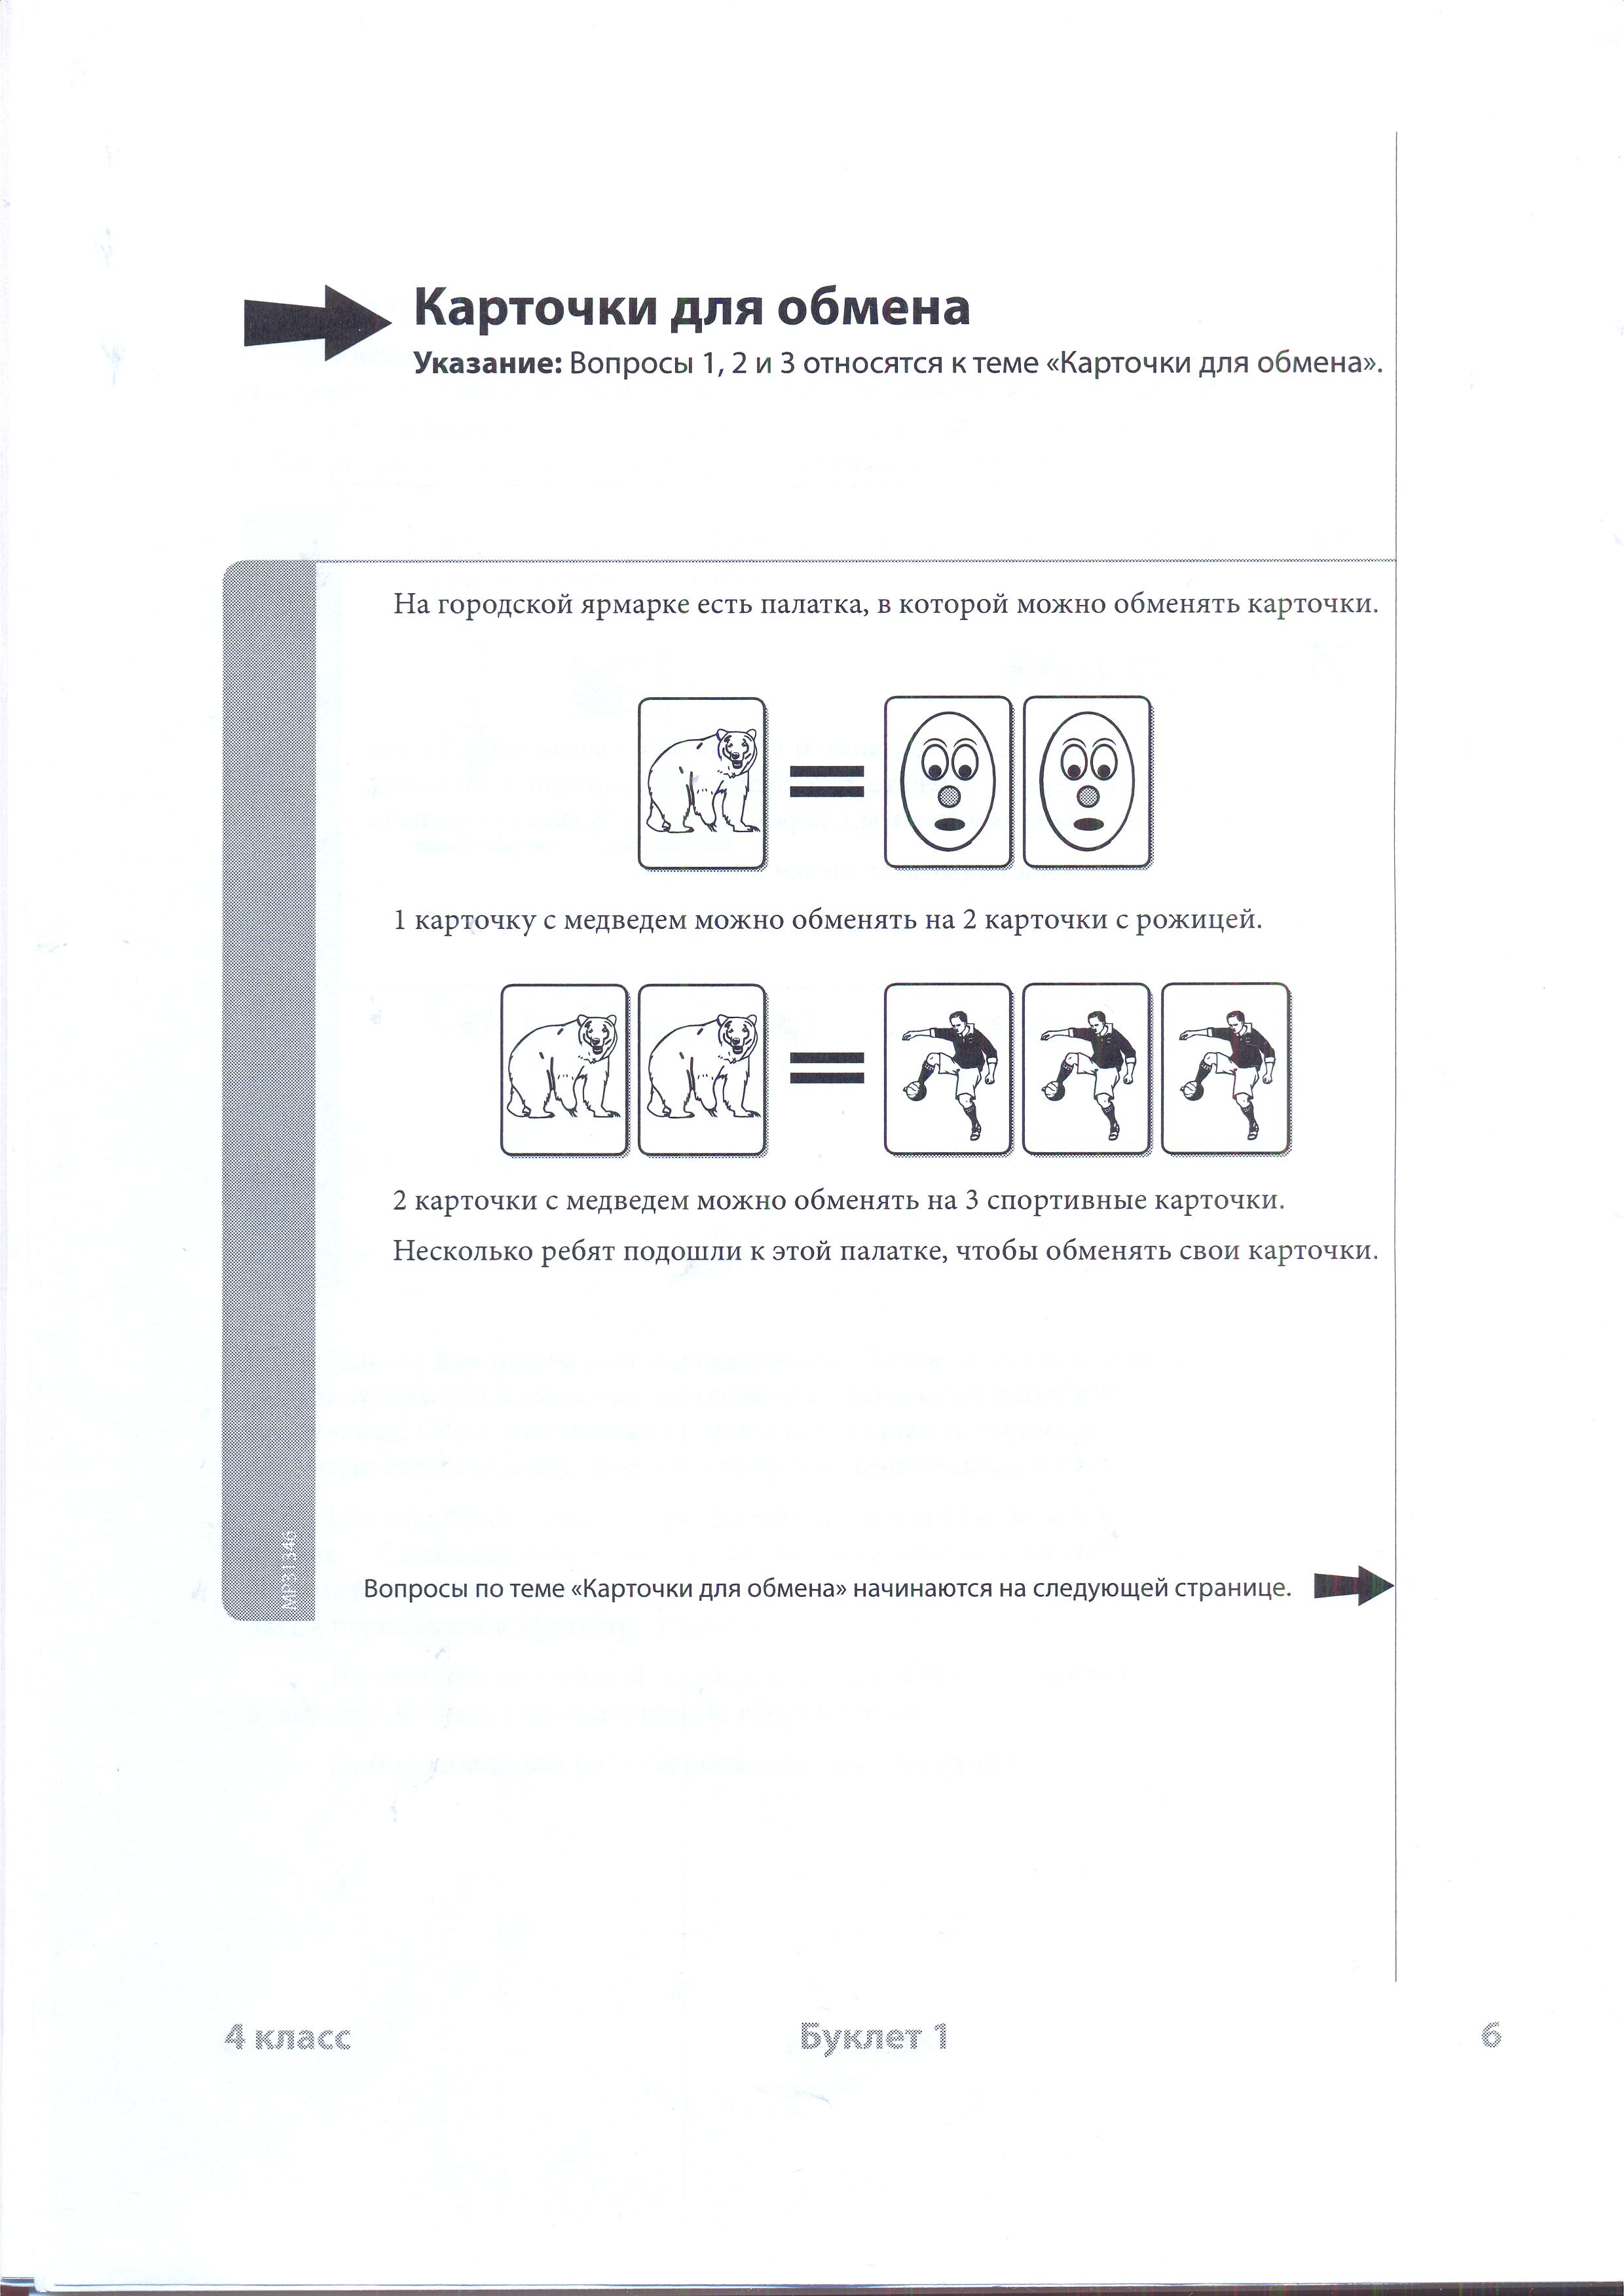 H:\Доклад ТИМСС Алматы 8.04.2014\TIMSS MATEM 4 kl_1 var\Matematic_4 kl_1 var0003.jpg